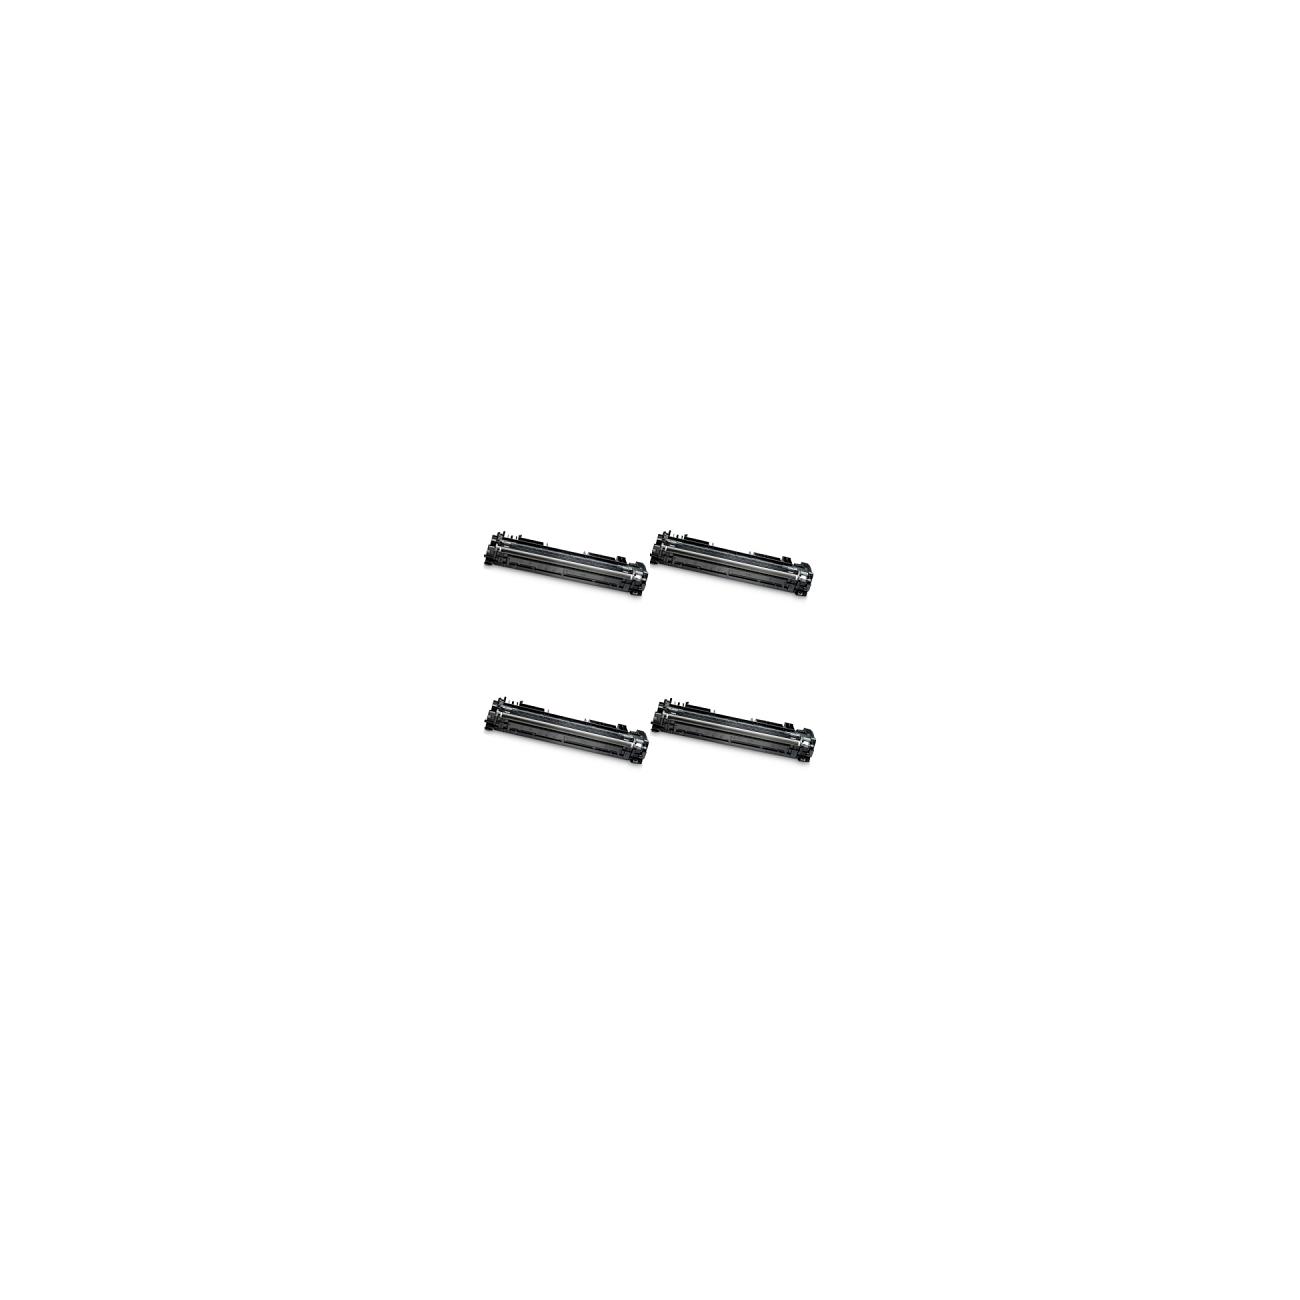 Offerta linea MORGAN CROMO - OFF.62